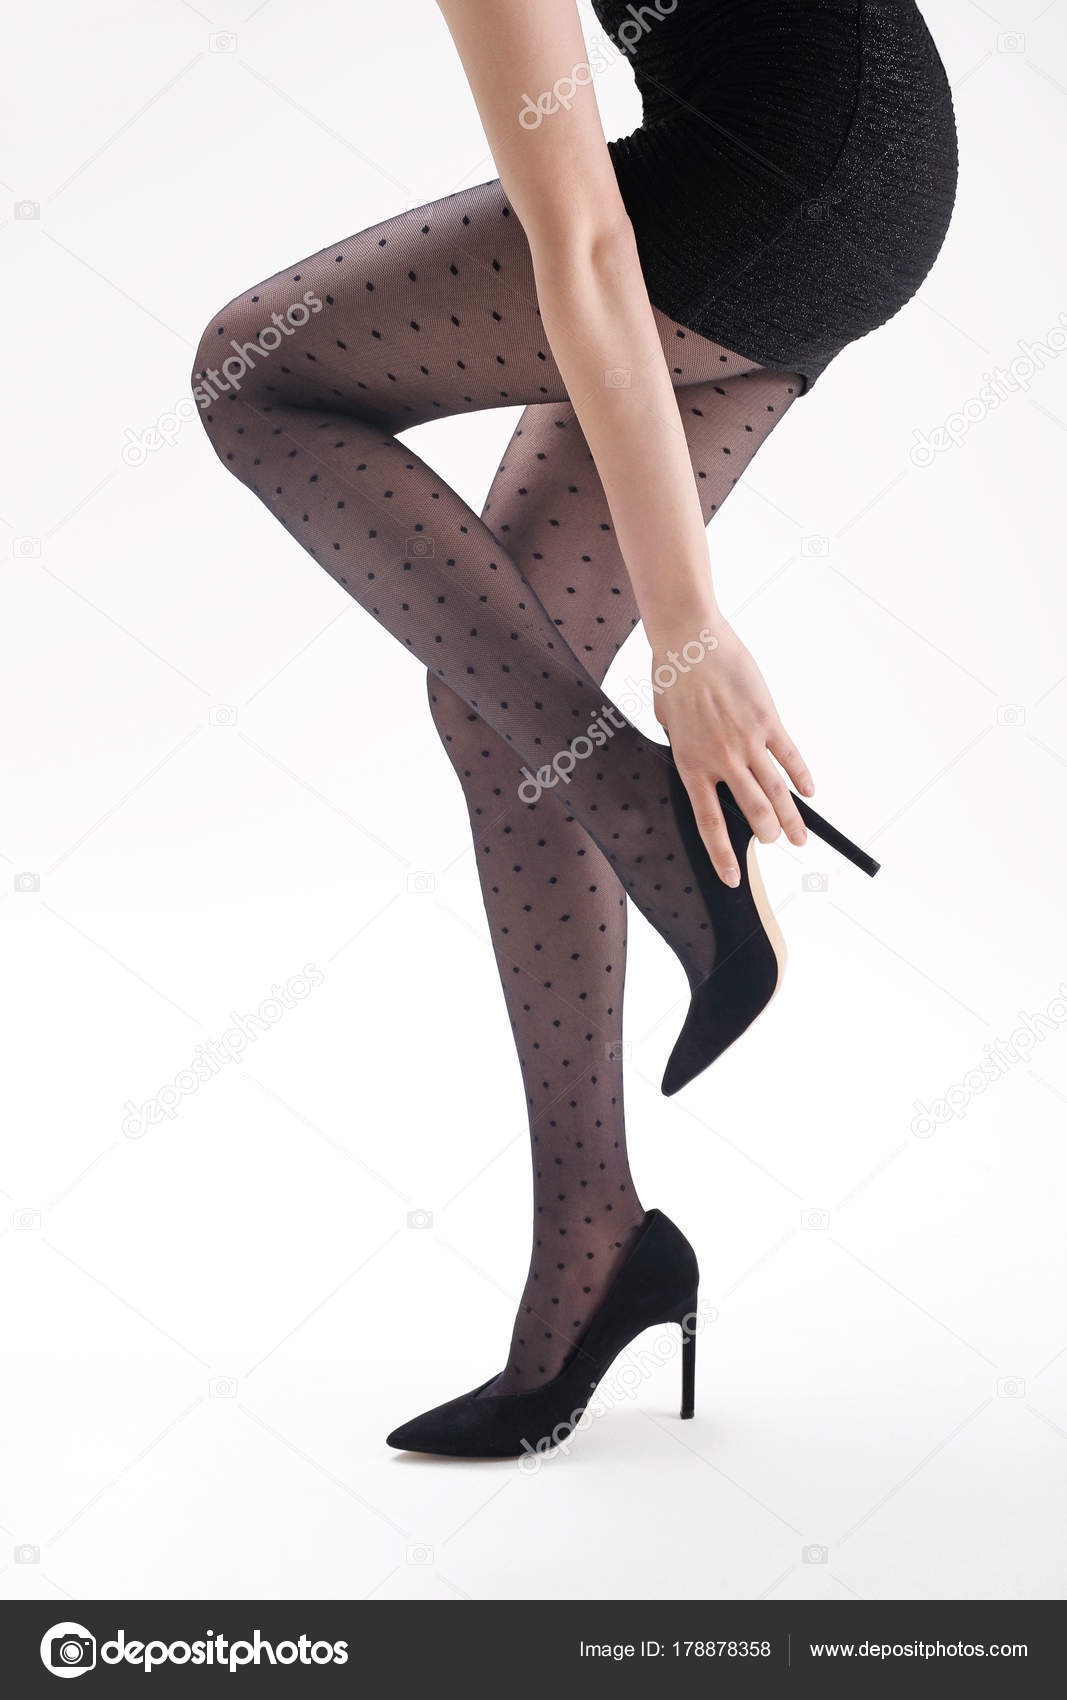 Harisnya Formás Női Lábak Fekete Harisnya Magas Sarkú Cipő — Stock ... 33900511c9